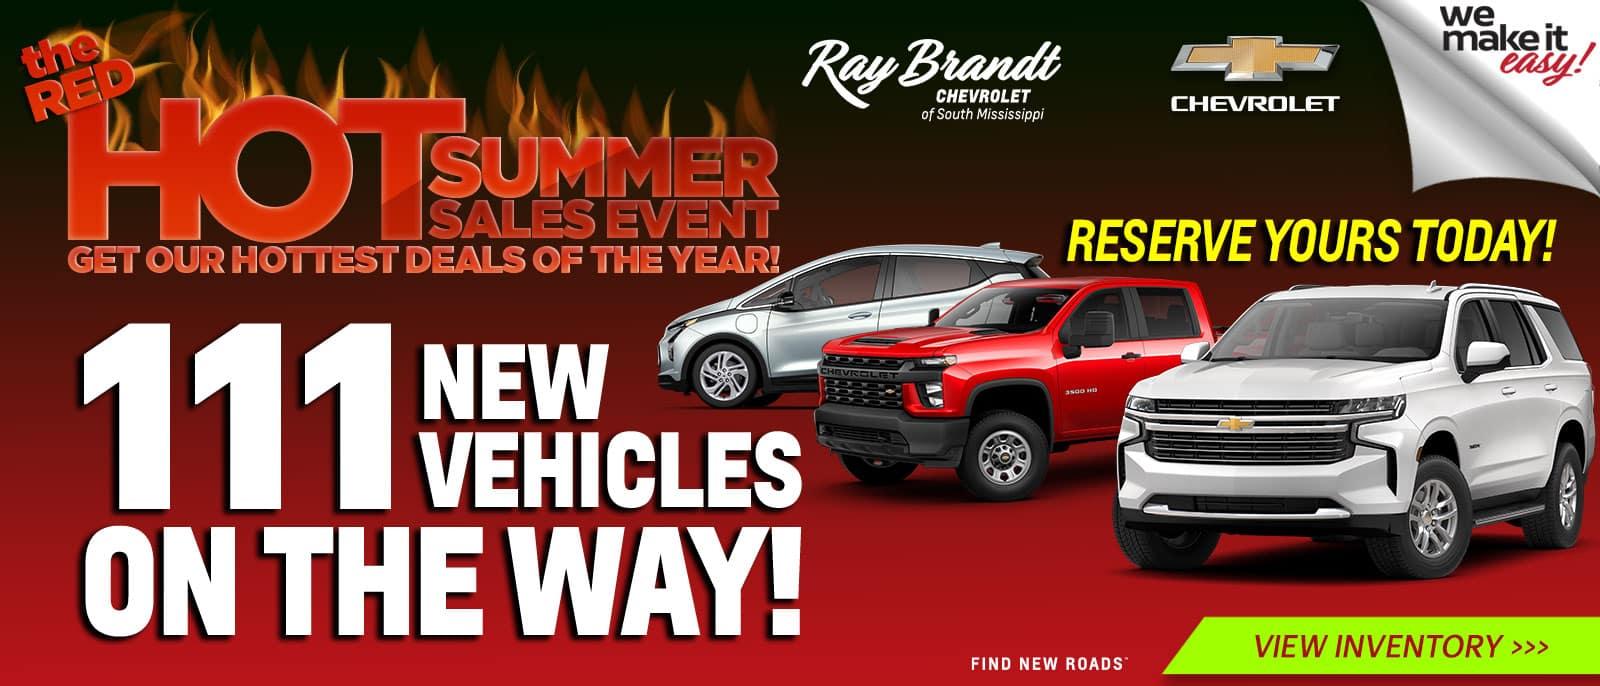 Ray Brandt Chevy Inventory